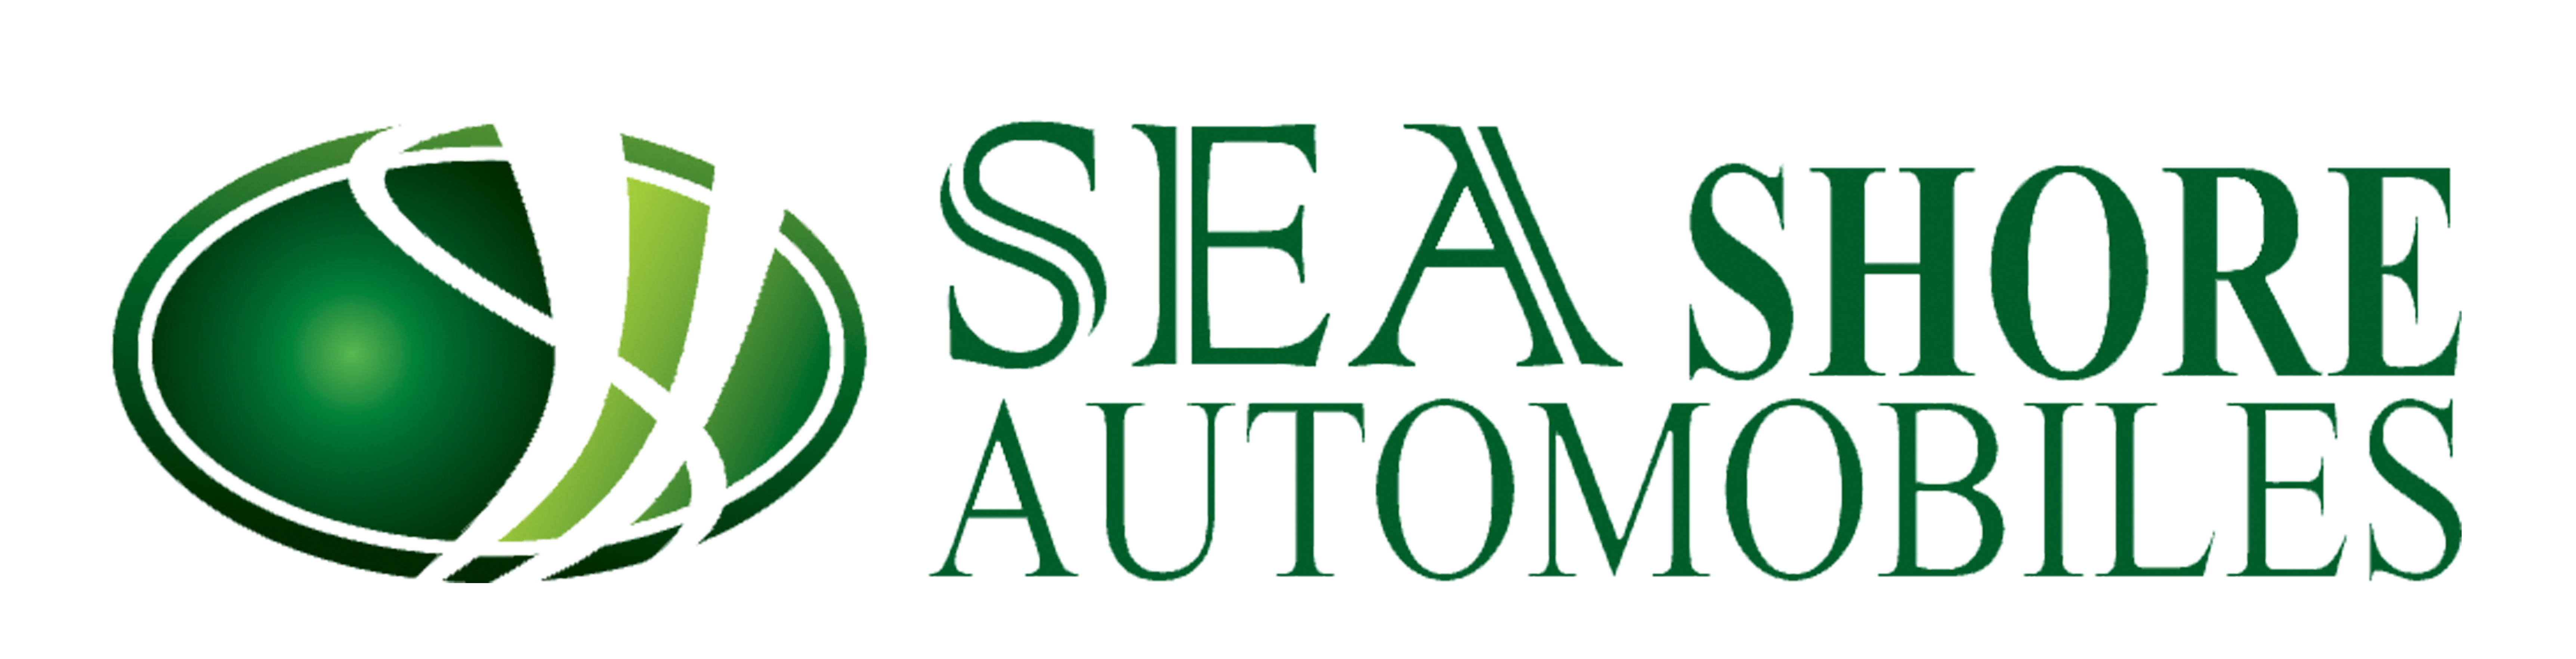 Seashore Automobiles